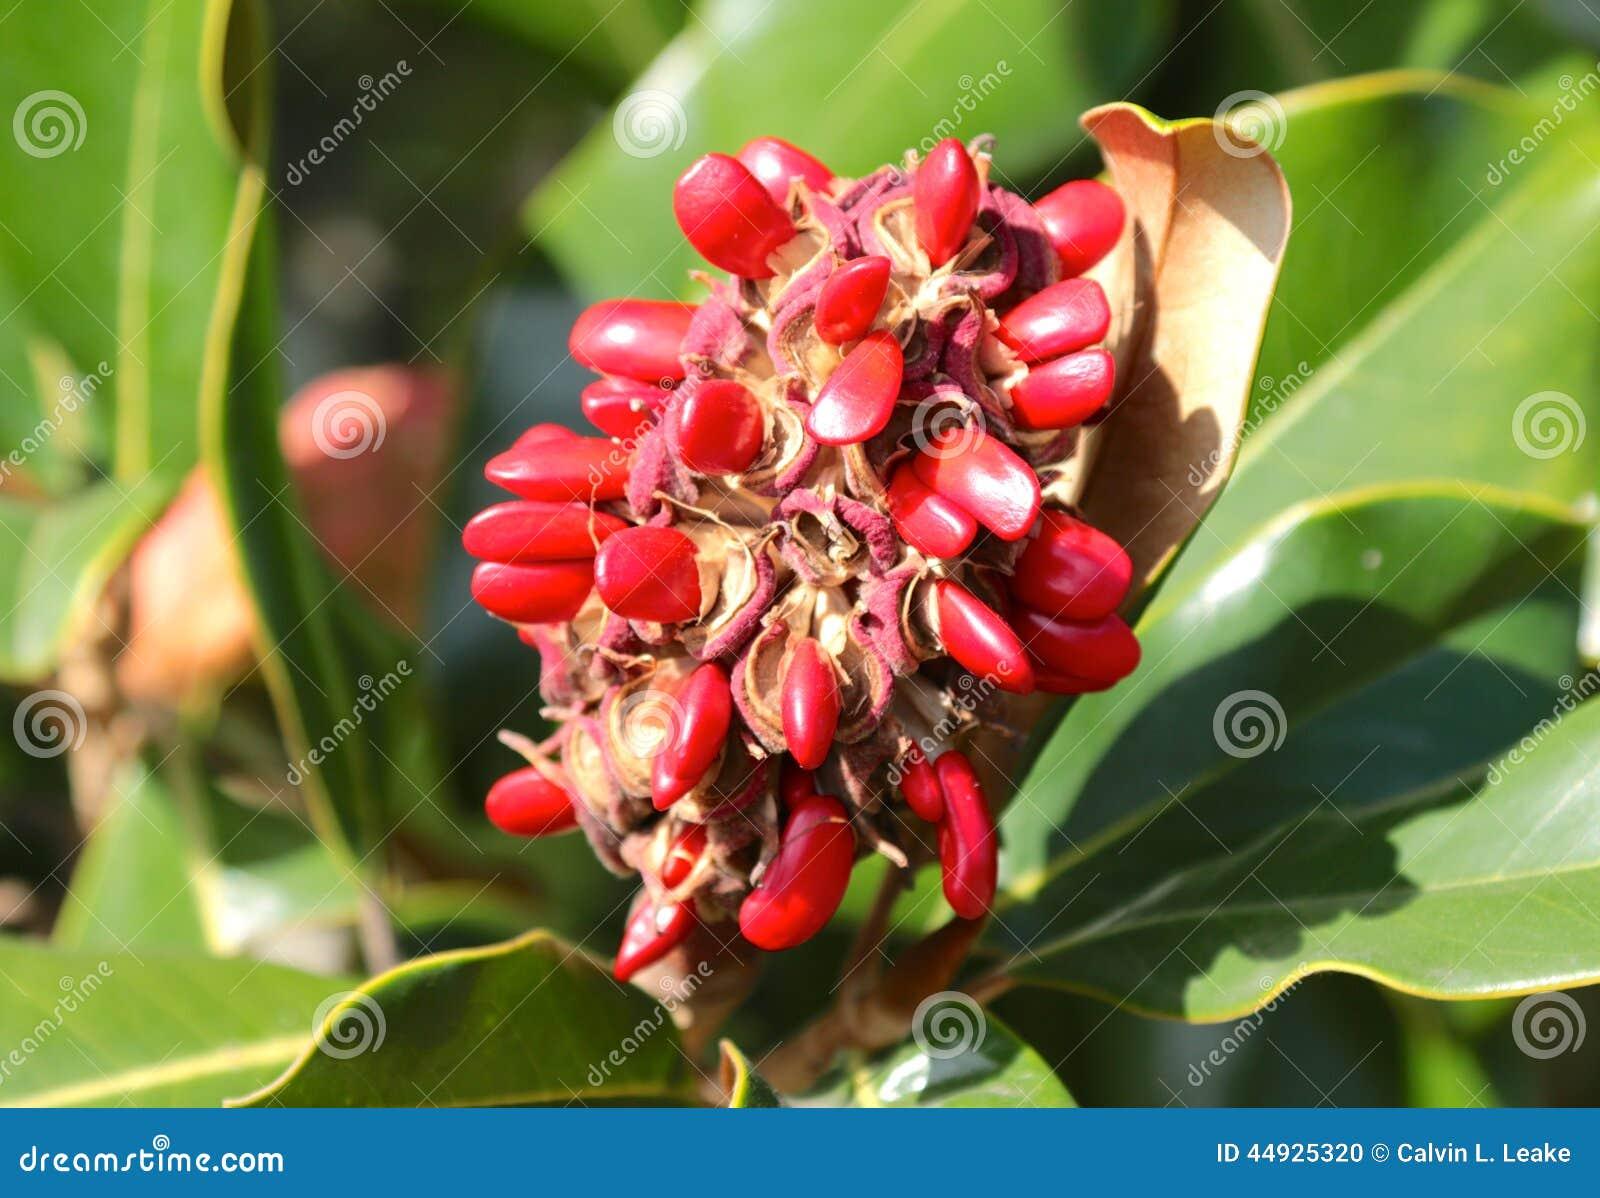 Magnolia Tree Seeds Stock Photo Image Of Pollination